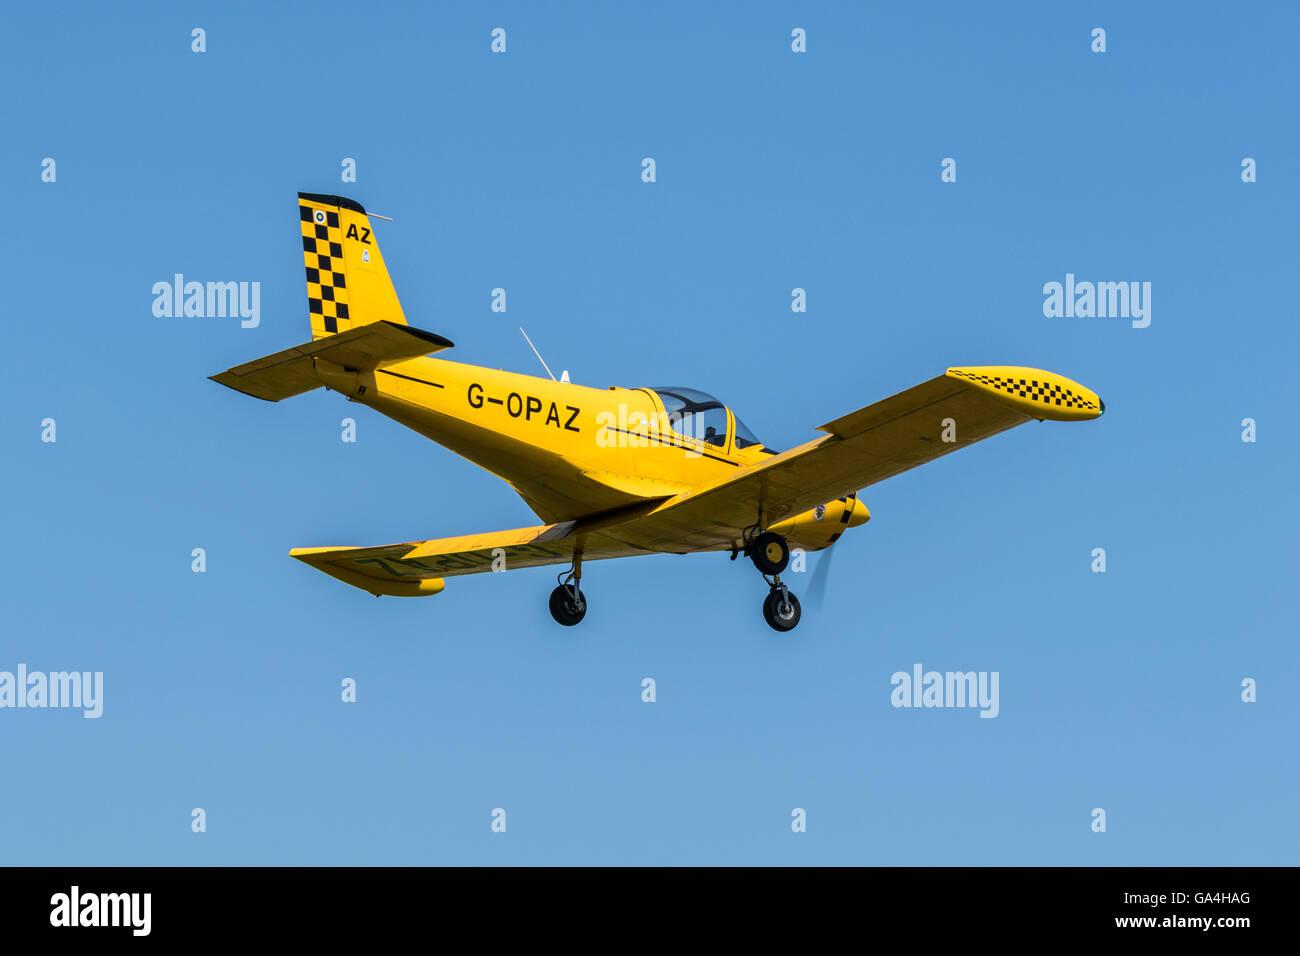 Pazmany PL-2 G-OPAZ landing at Sturgate Airfield - Stock Image